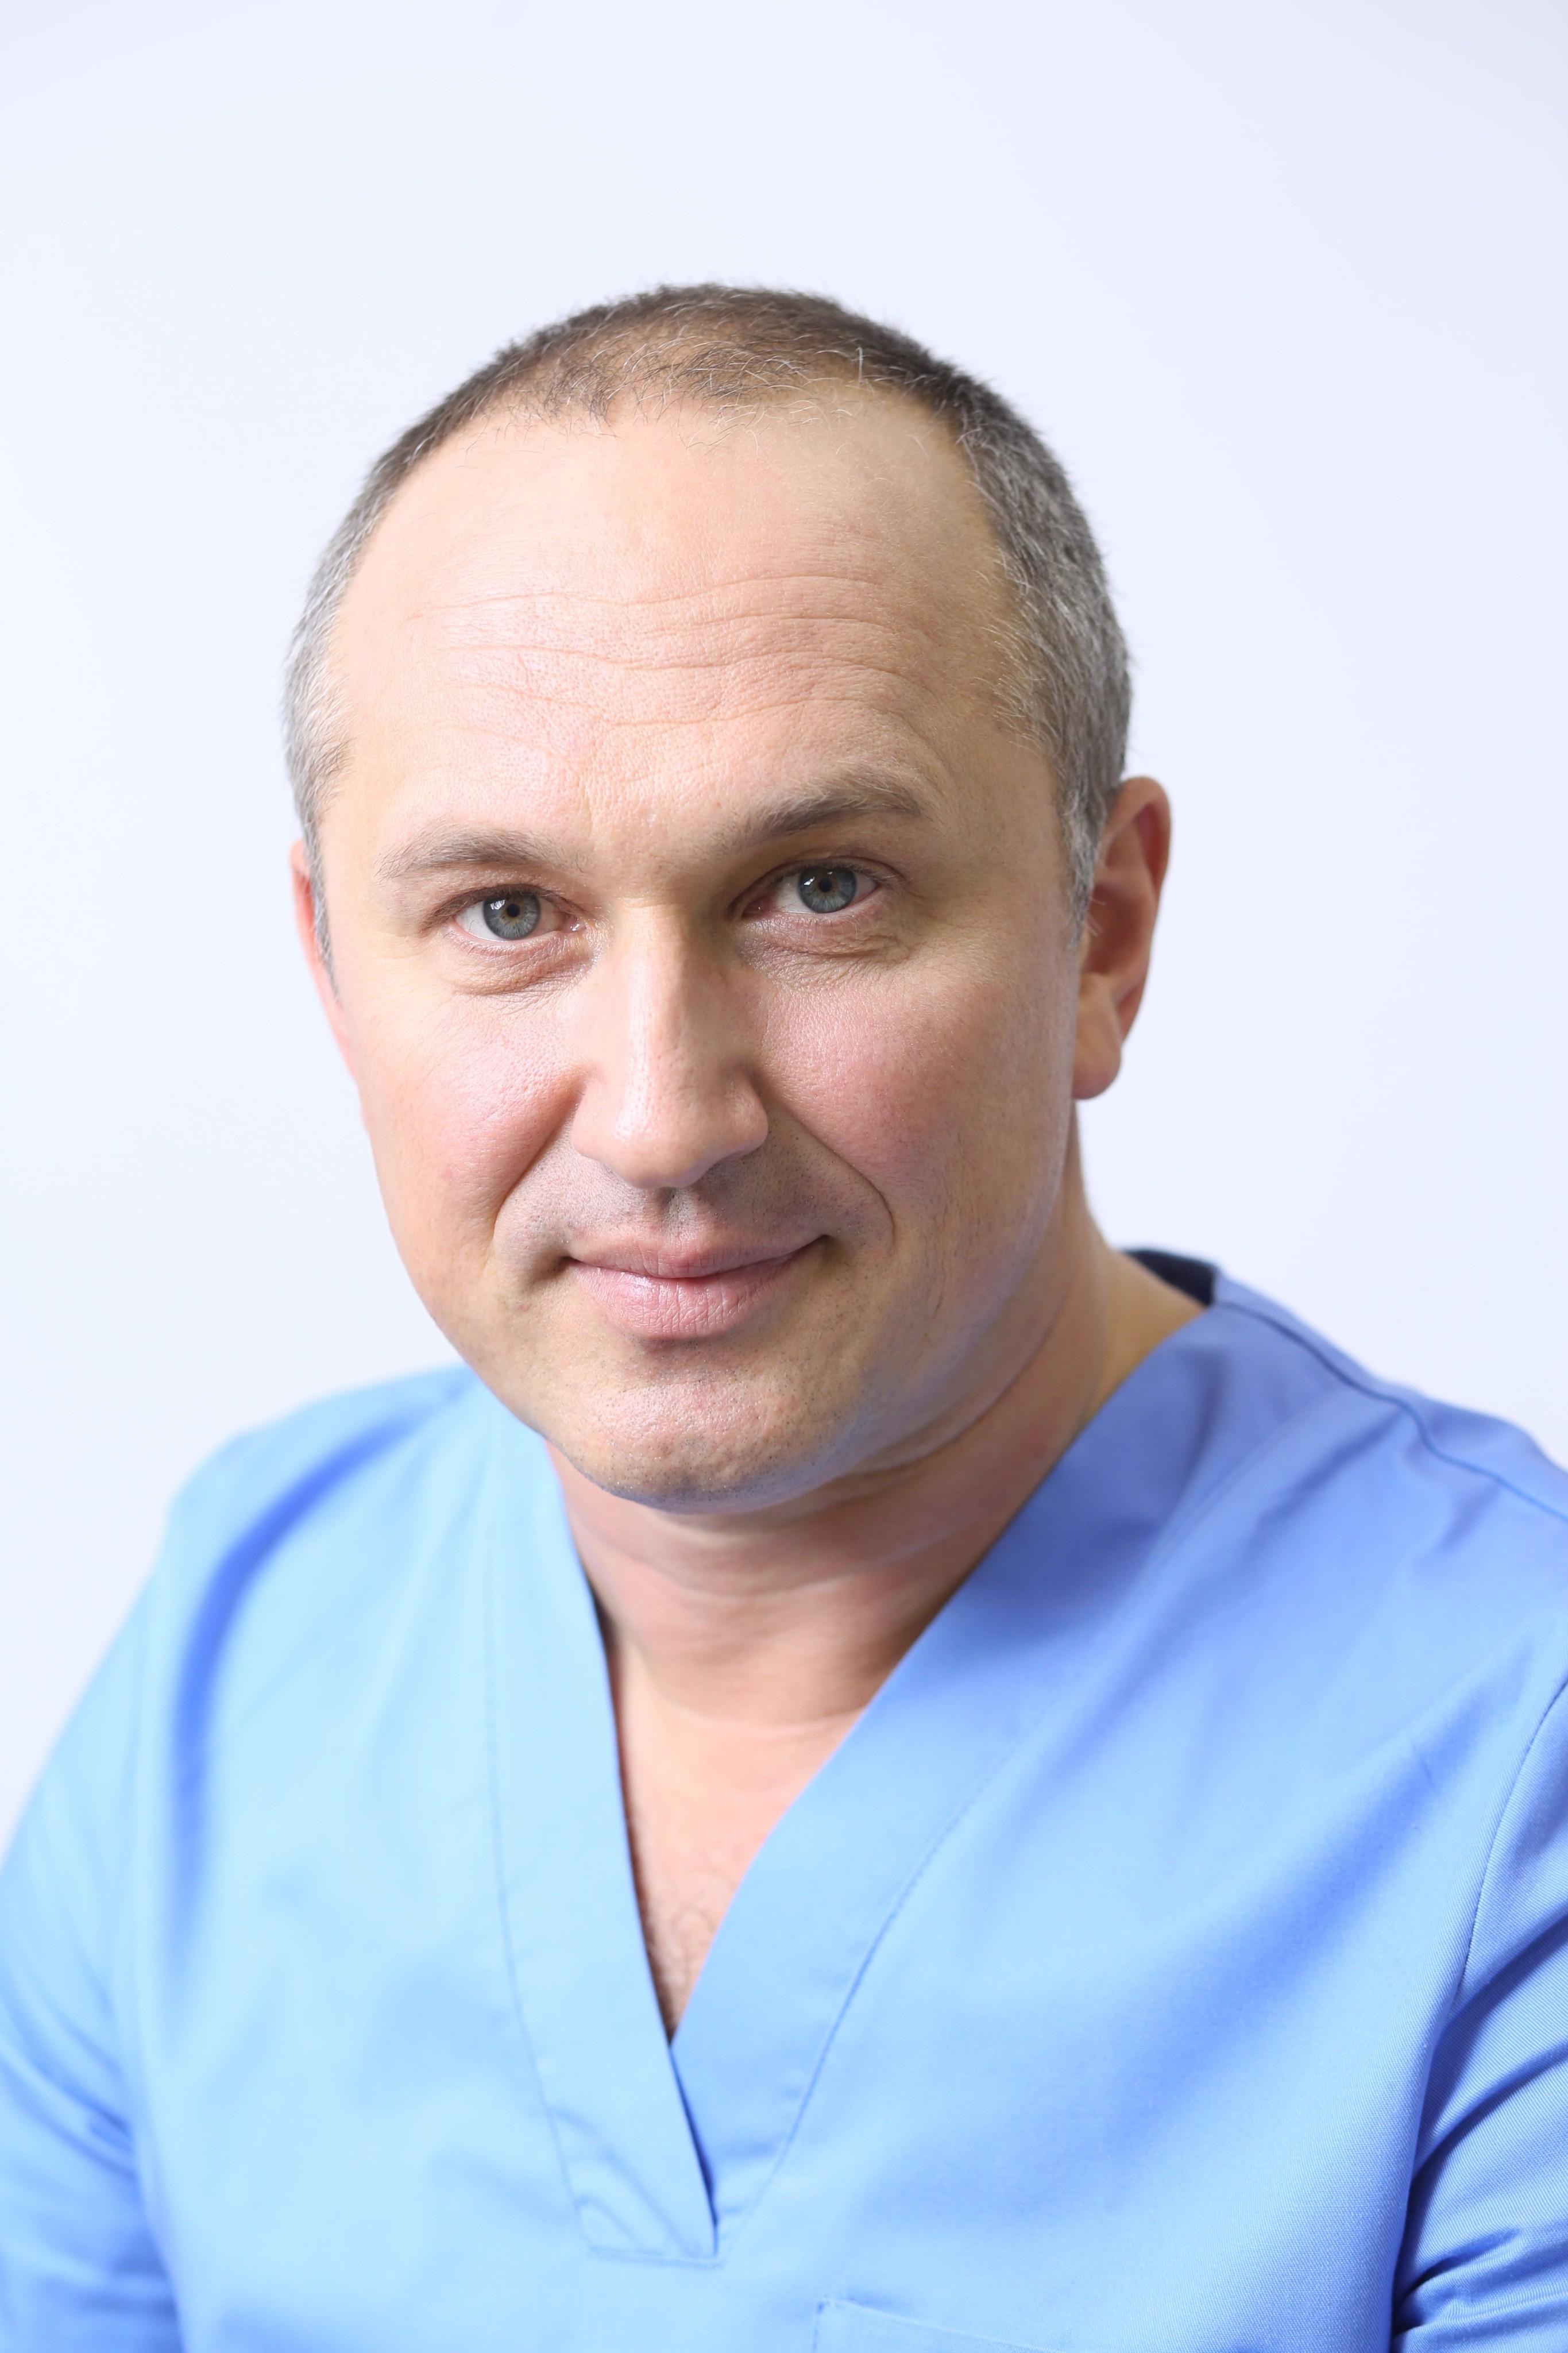 Владимир Платохин, пластический хирург: